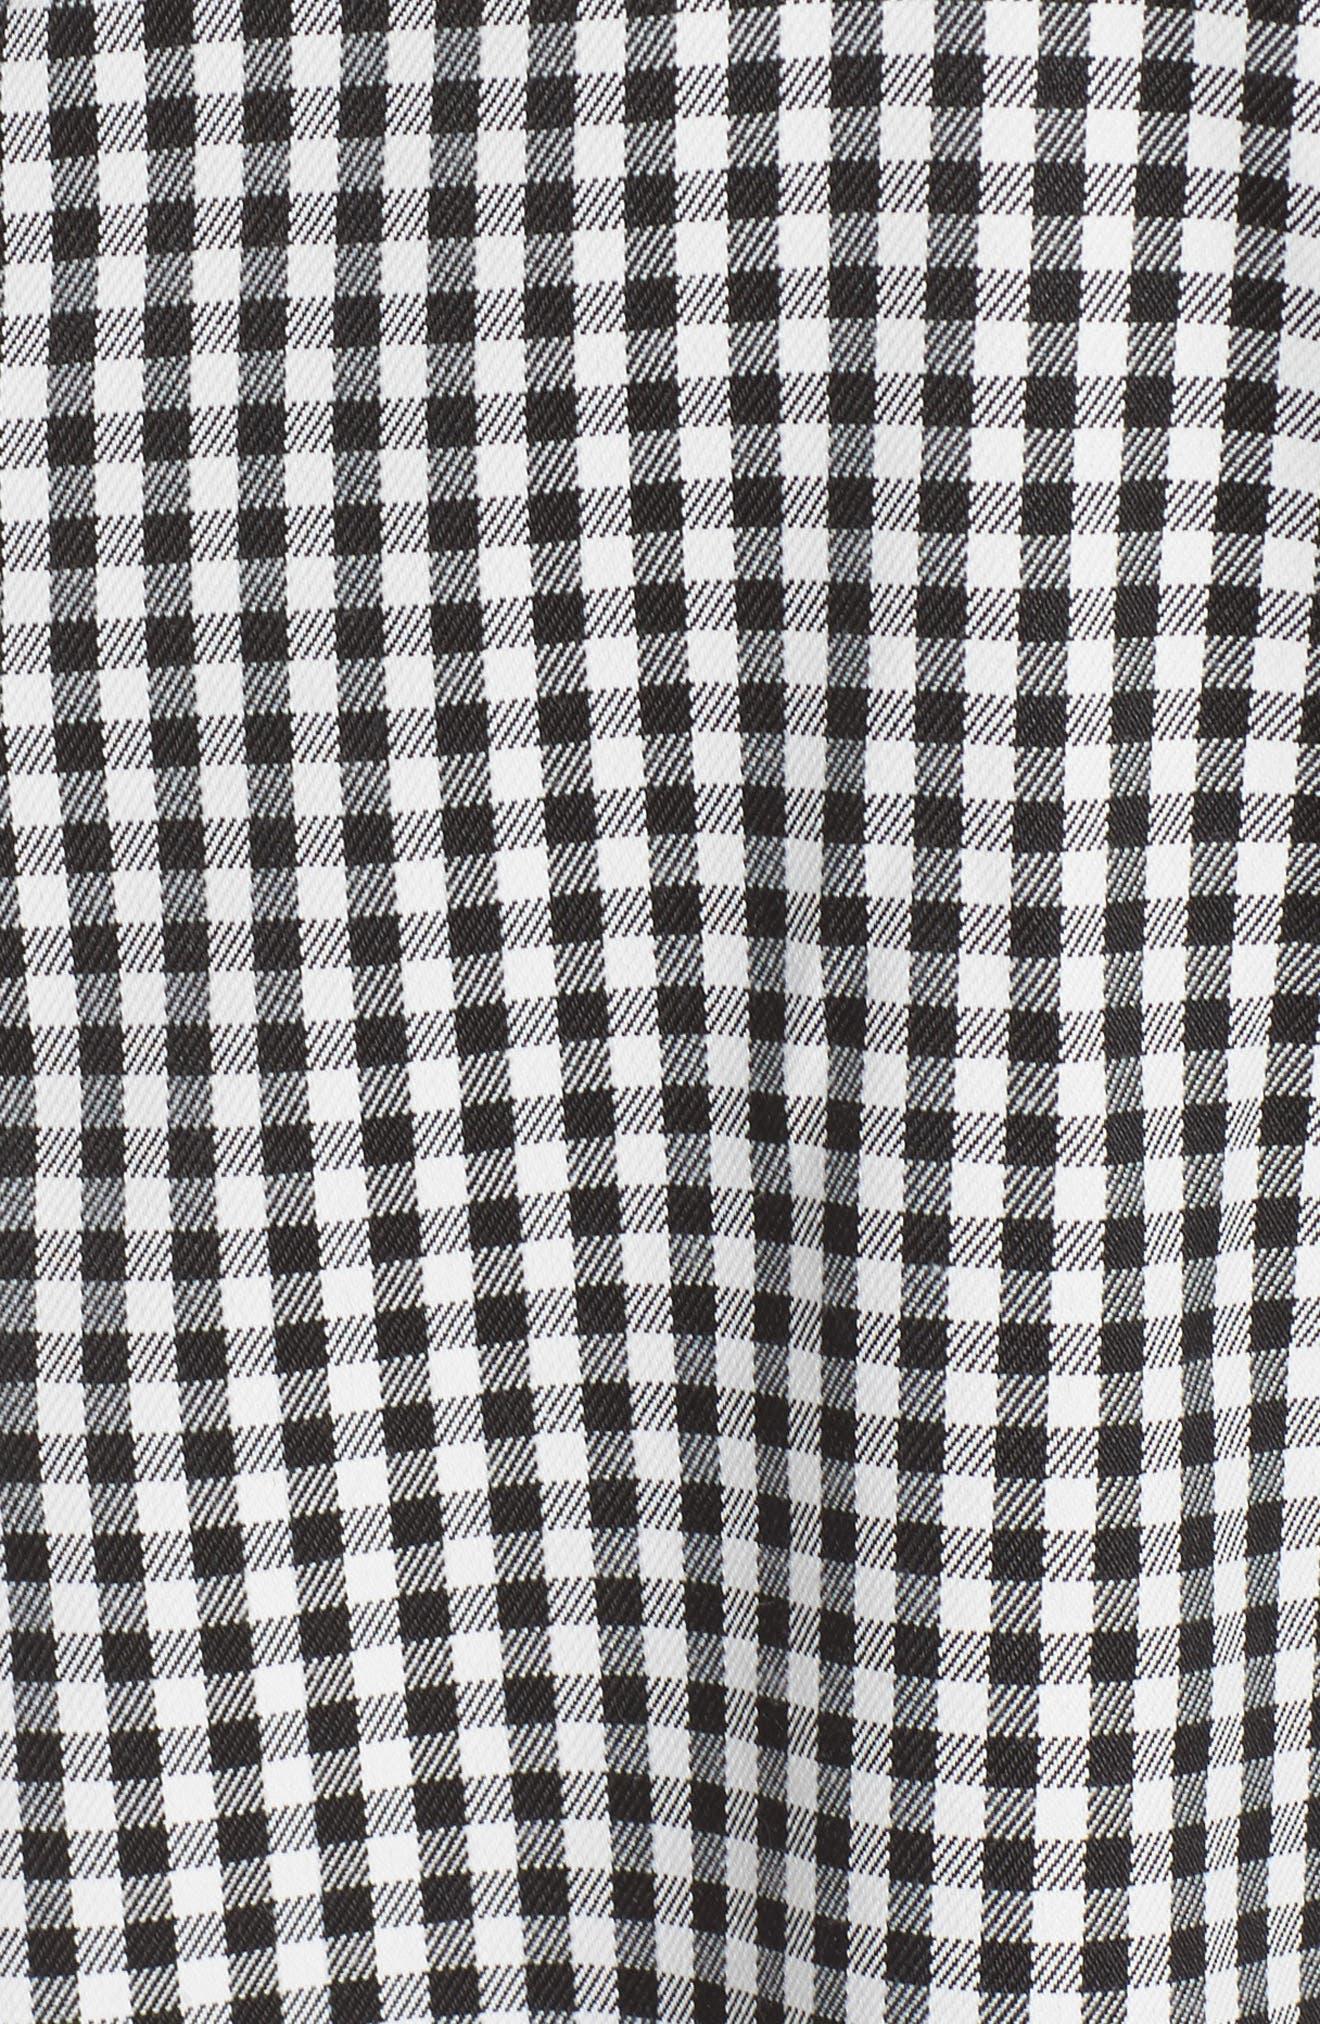 One-Shoulder Gingham Dress,                             Alternate thumbnail 5, color,                             Black/ White